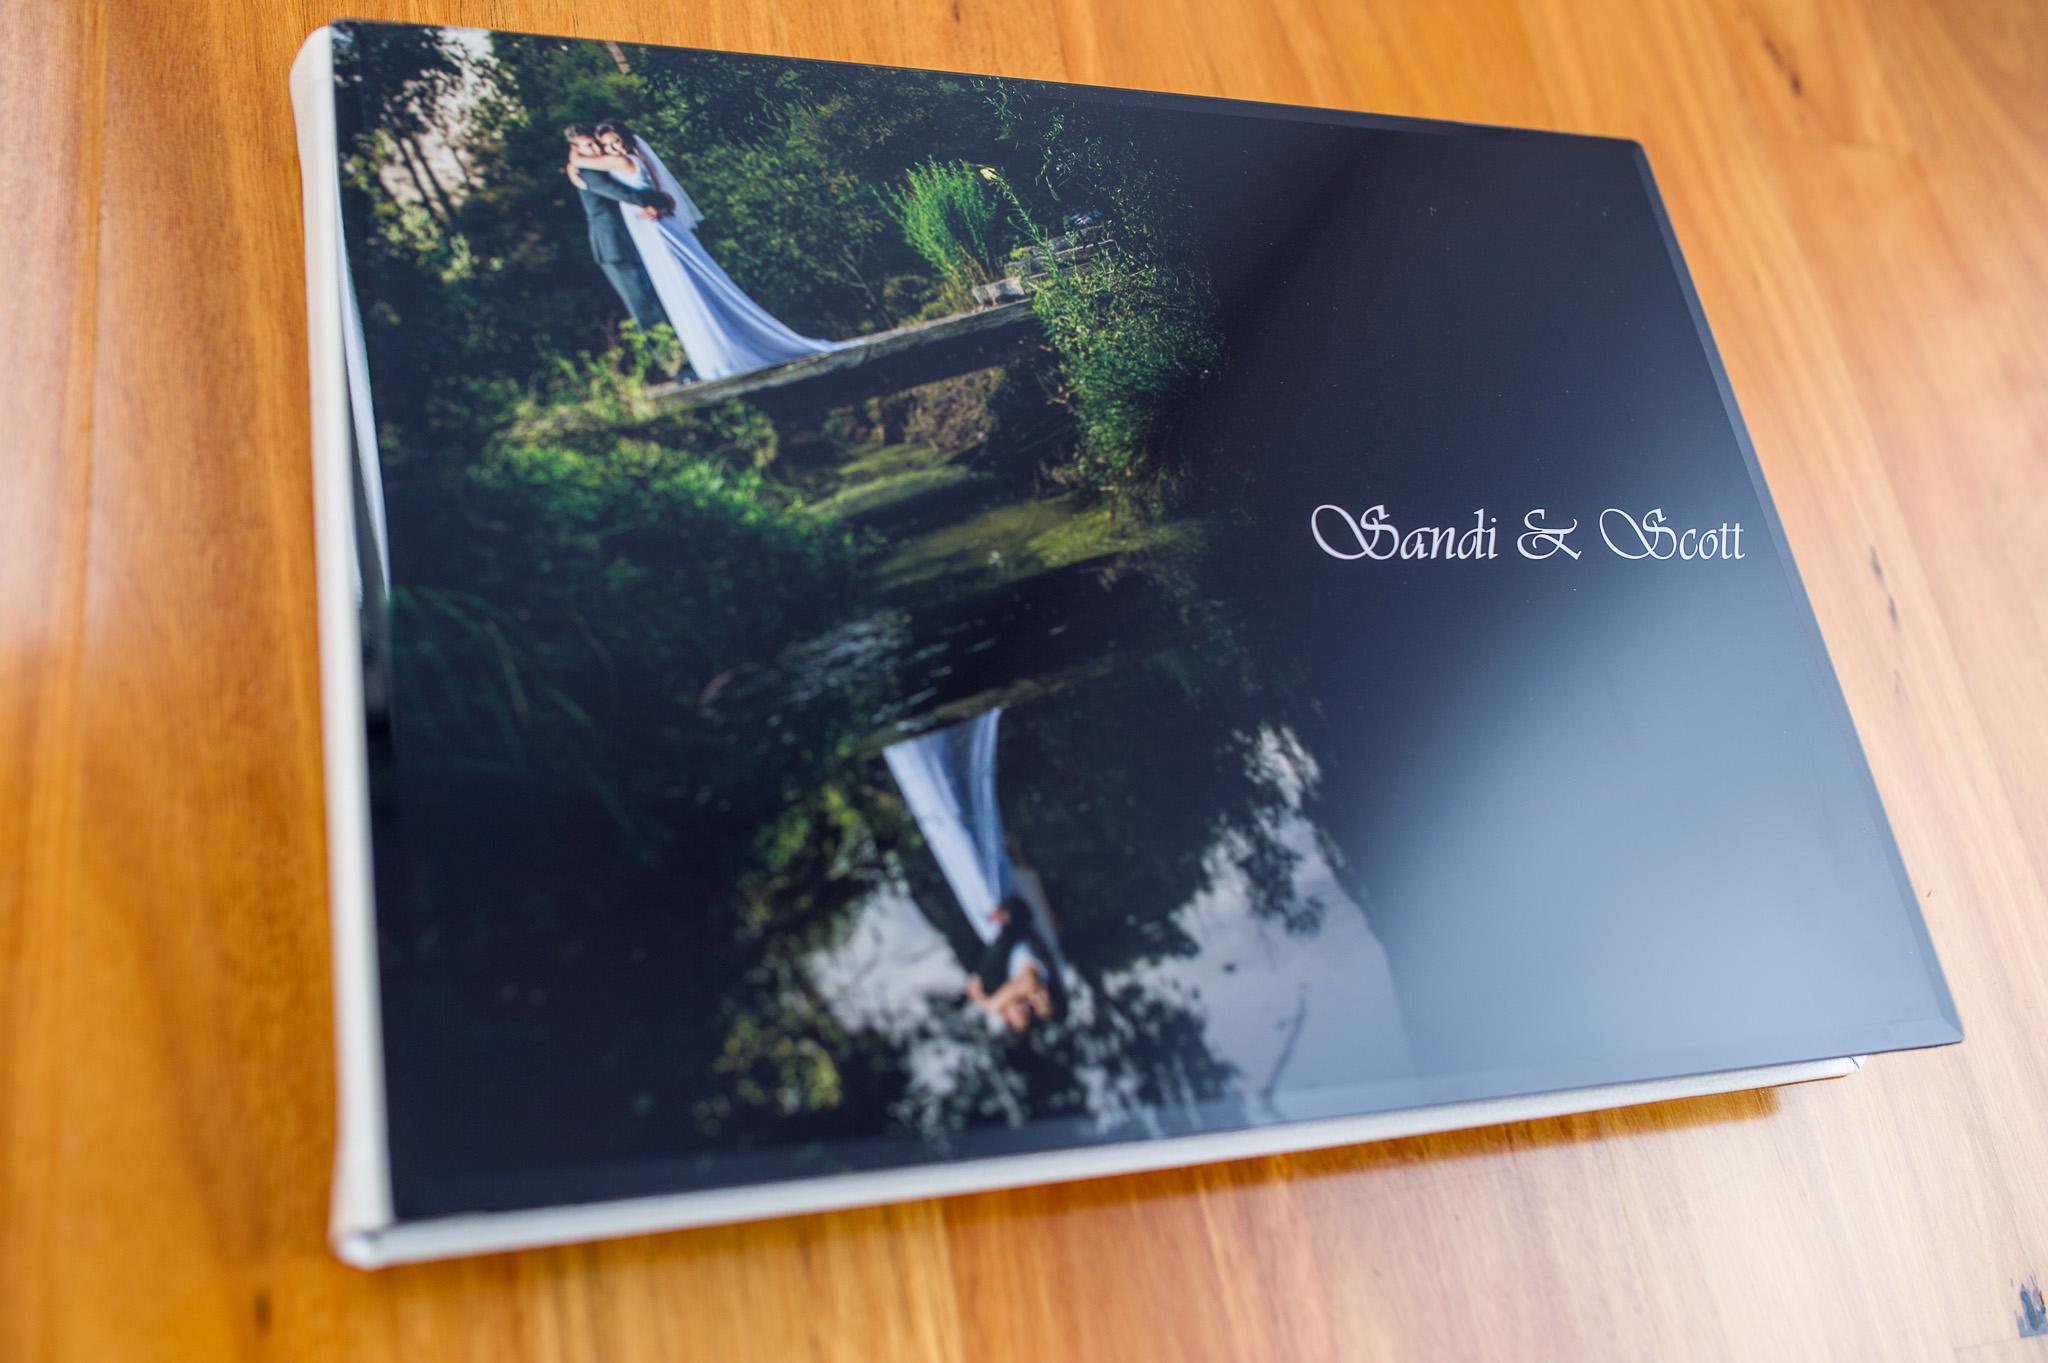 Sample-Album-Packshot-Potters-006.jpg